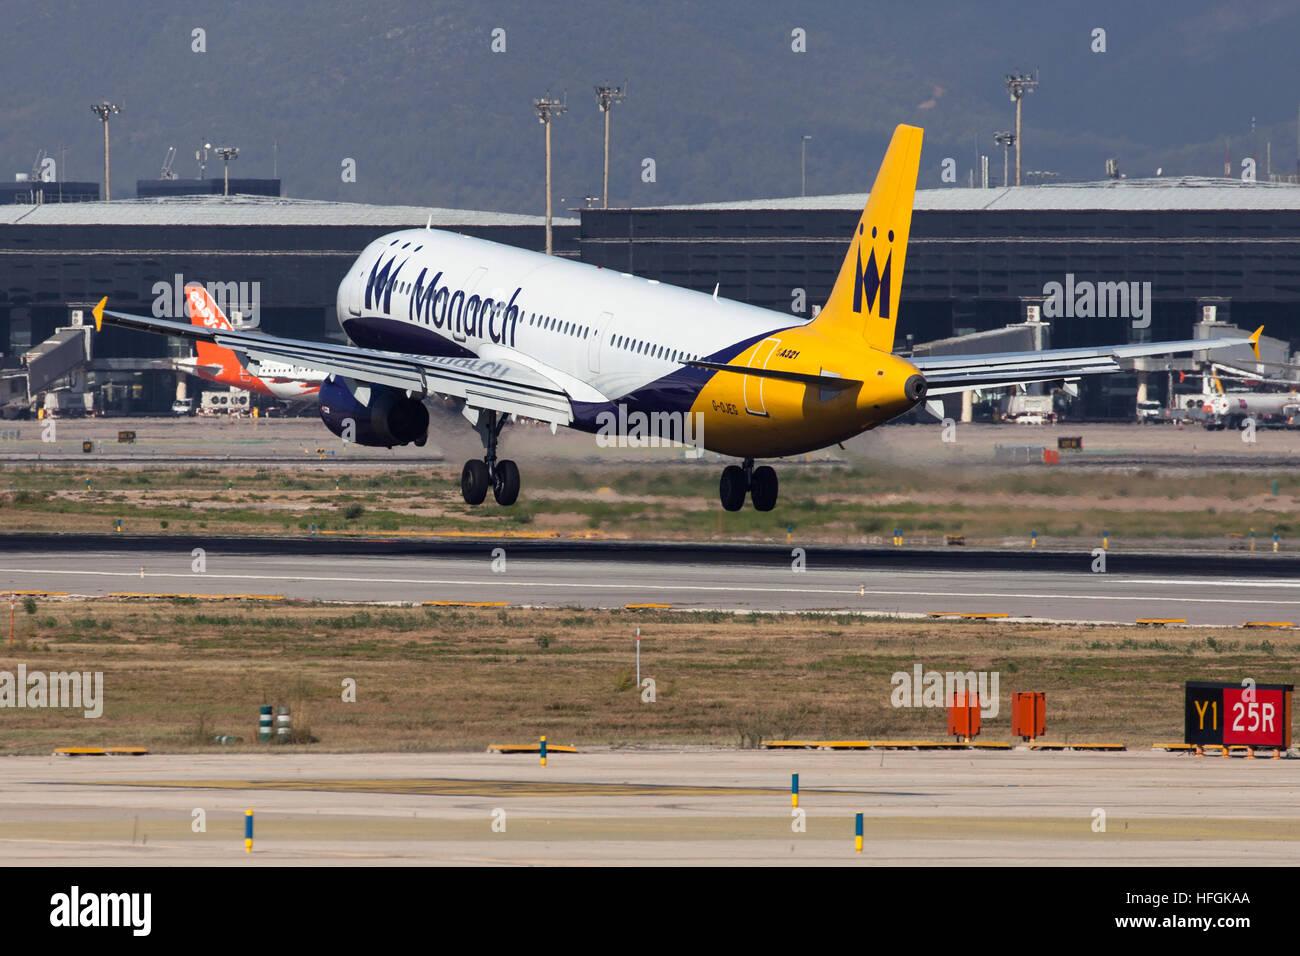 Monarch Airlines Airbus A321 landing at El Prat Airport in Barcelona, Spain. - Stock Image